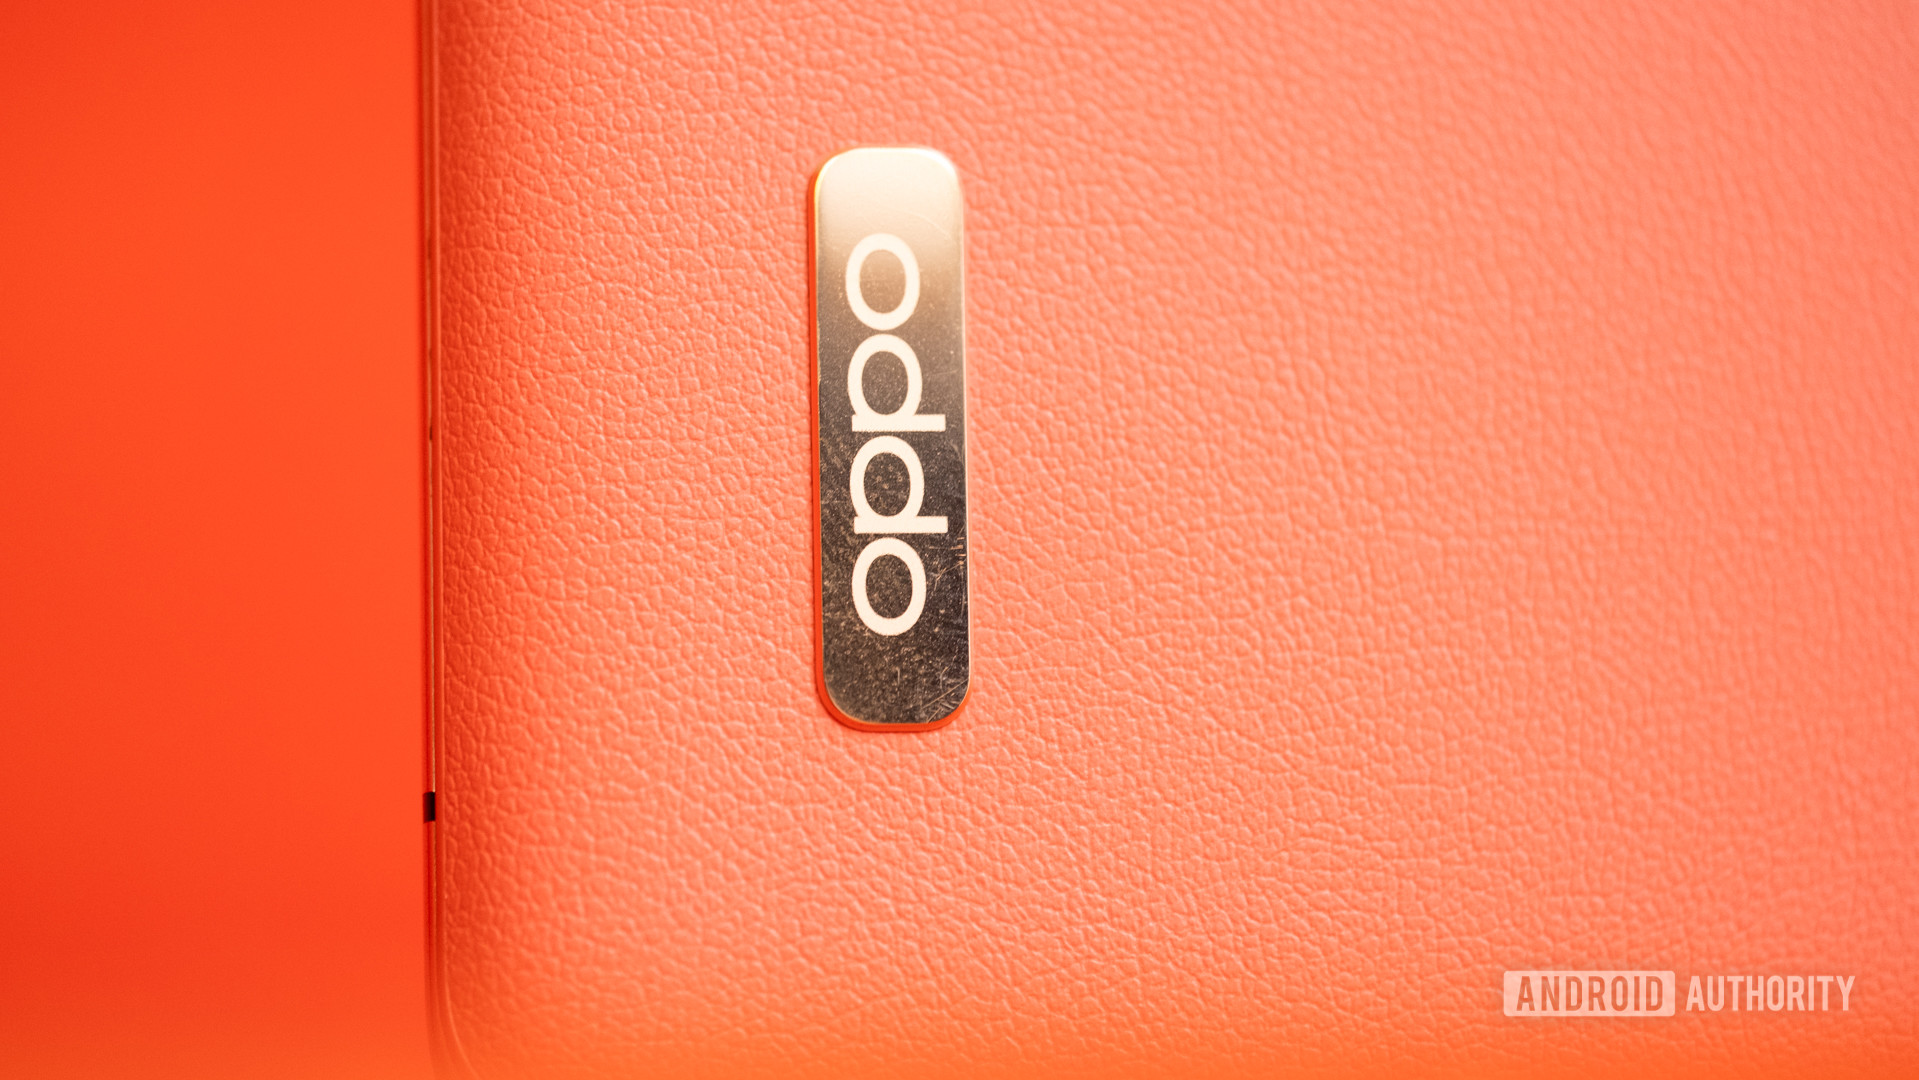 Oppo Find X2 Pro emblem macro